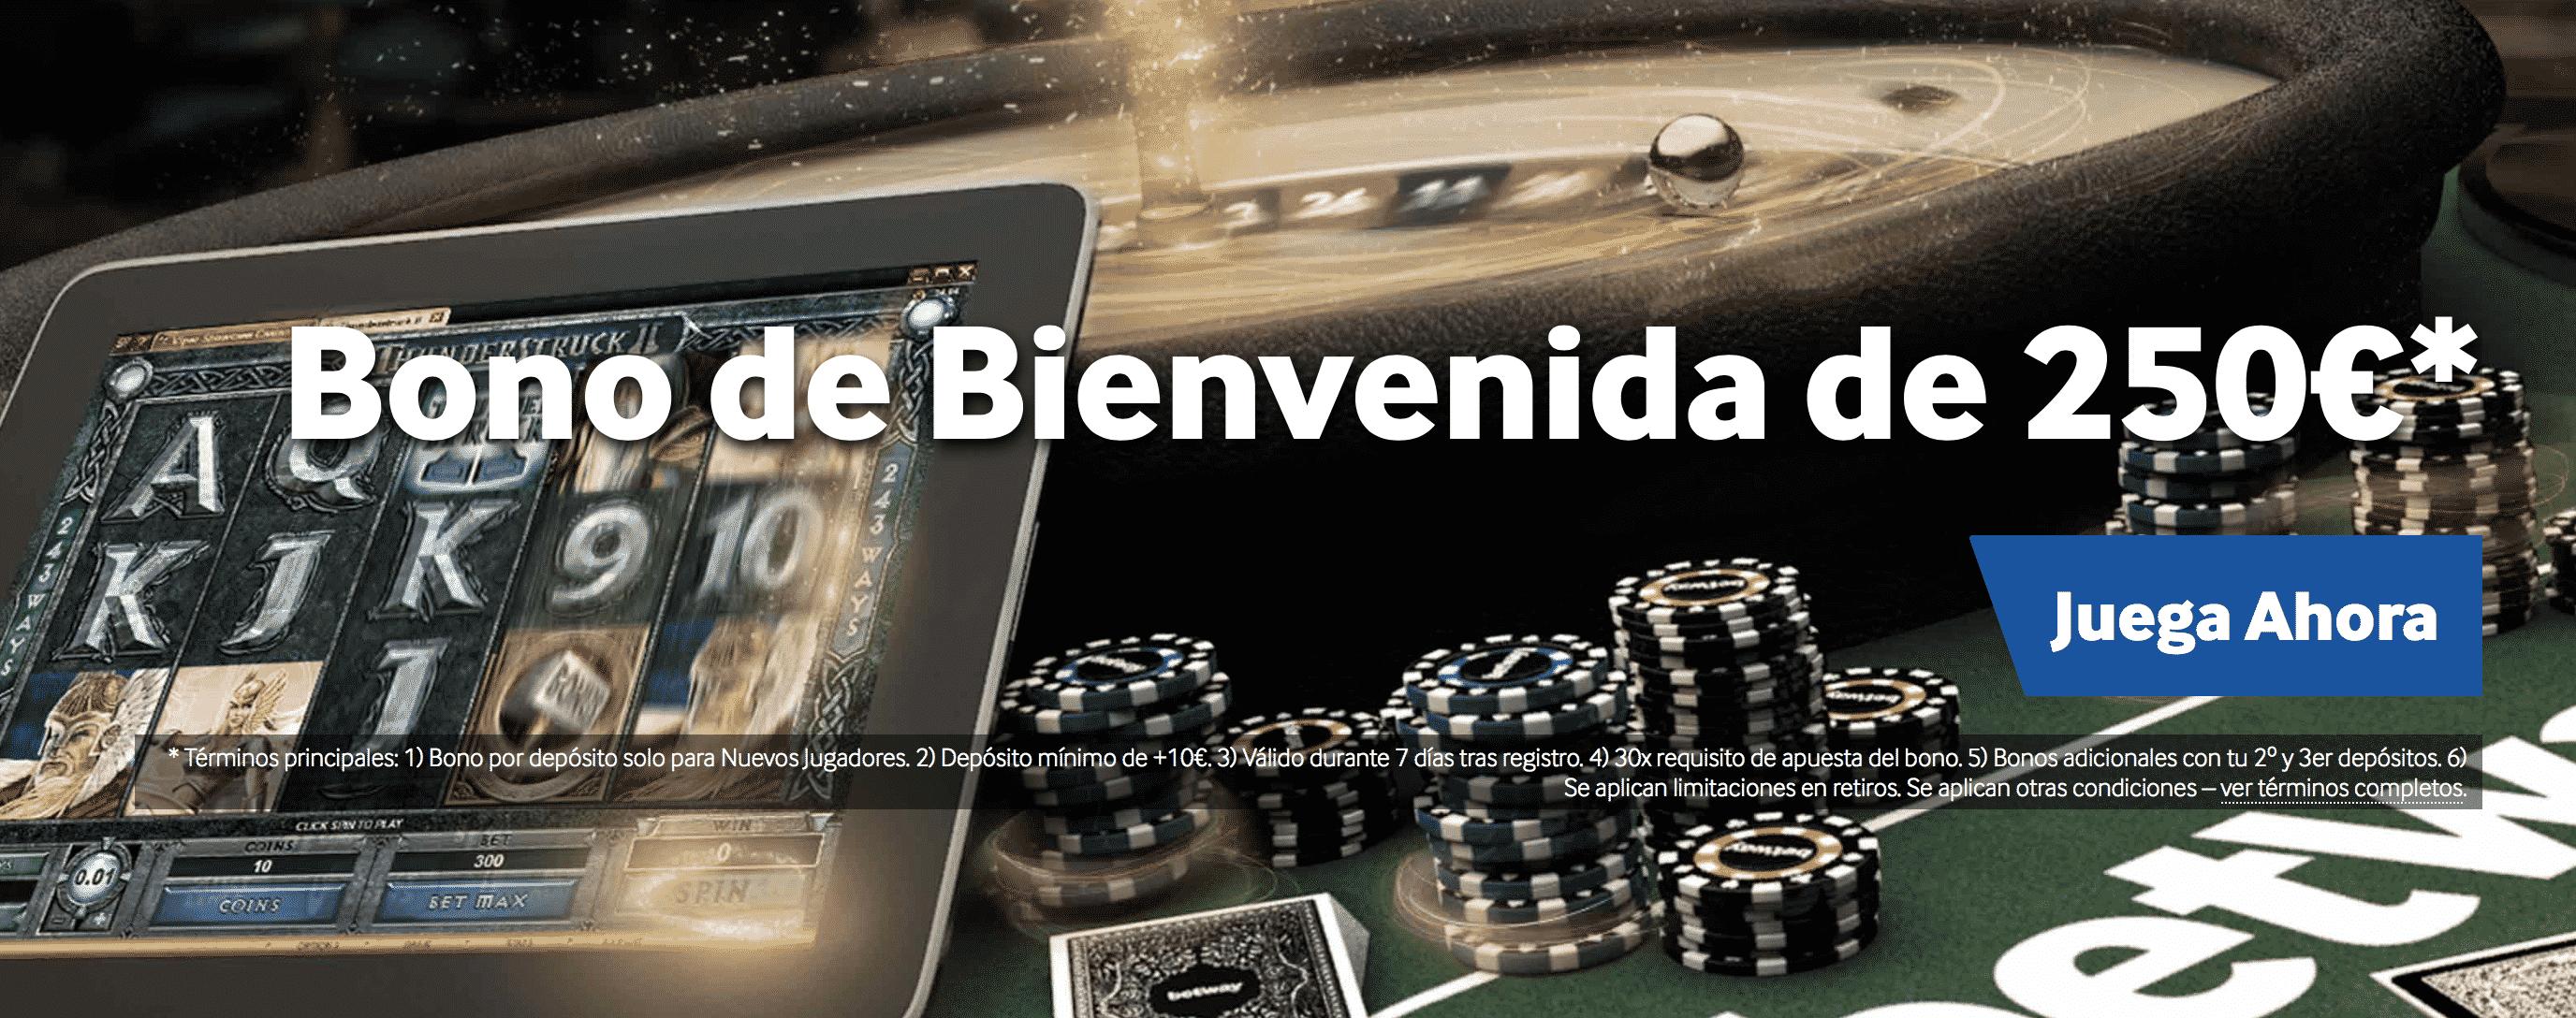 Brokers que te regalan bonos ruleta Americana 7887